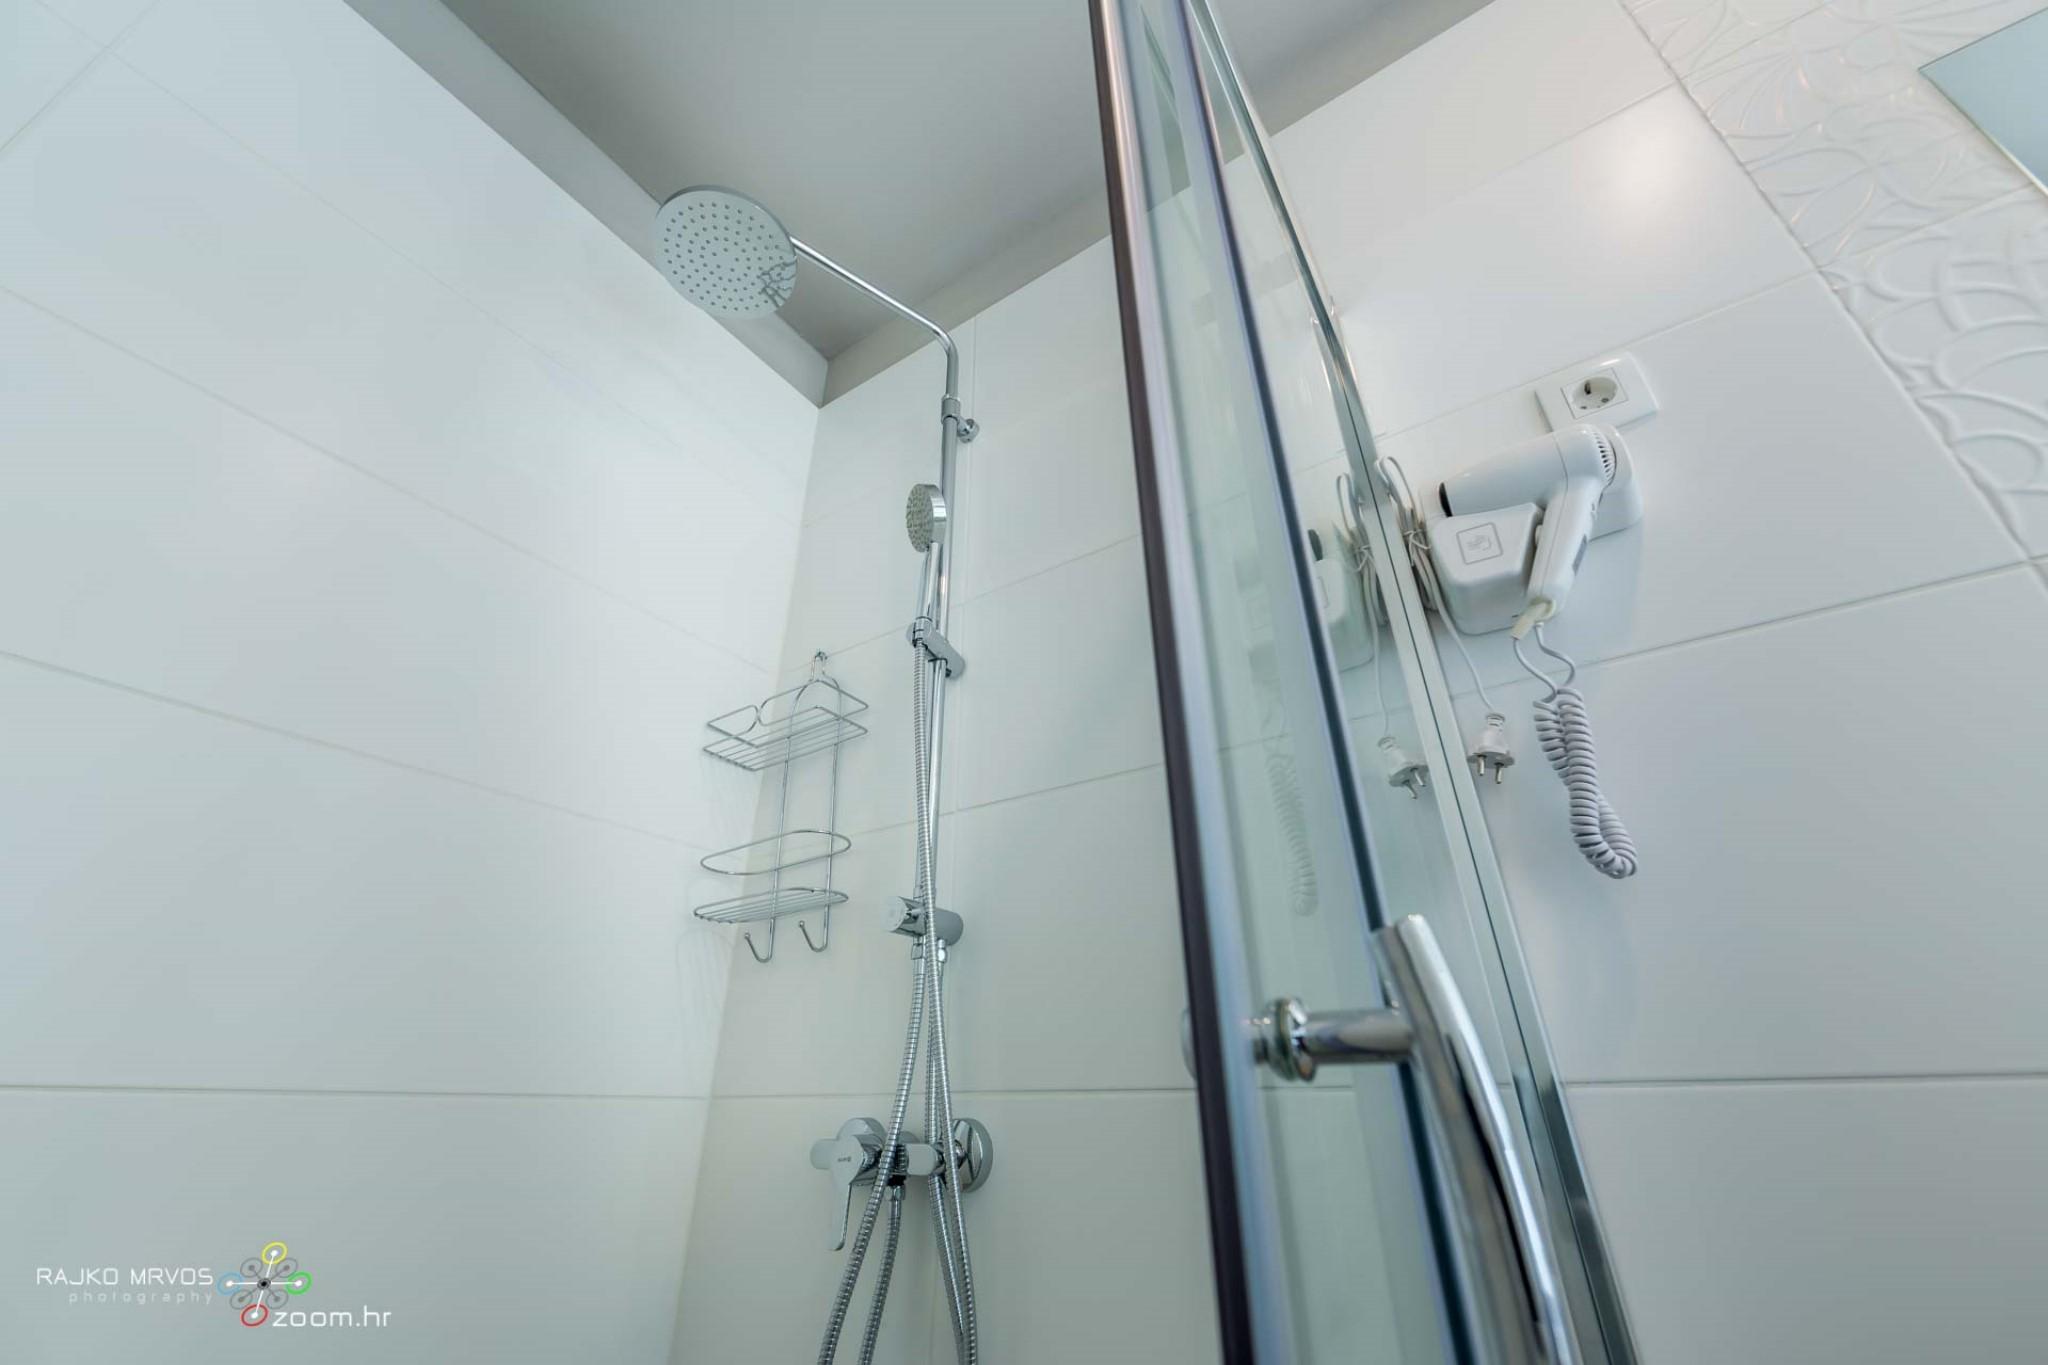 fotografiranje-interijera-fotograf-eksterijera-apartmana-vila-kuca-apartmani-Preelook-93